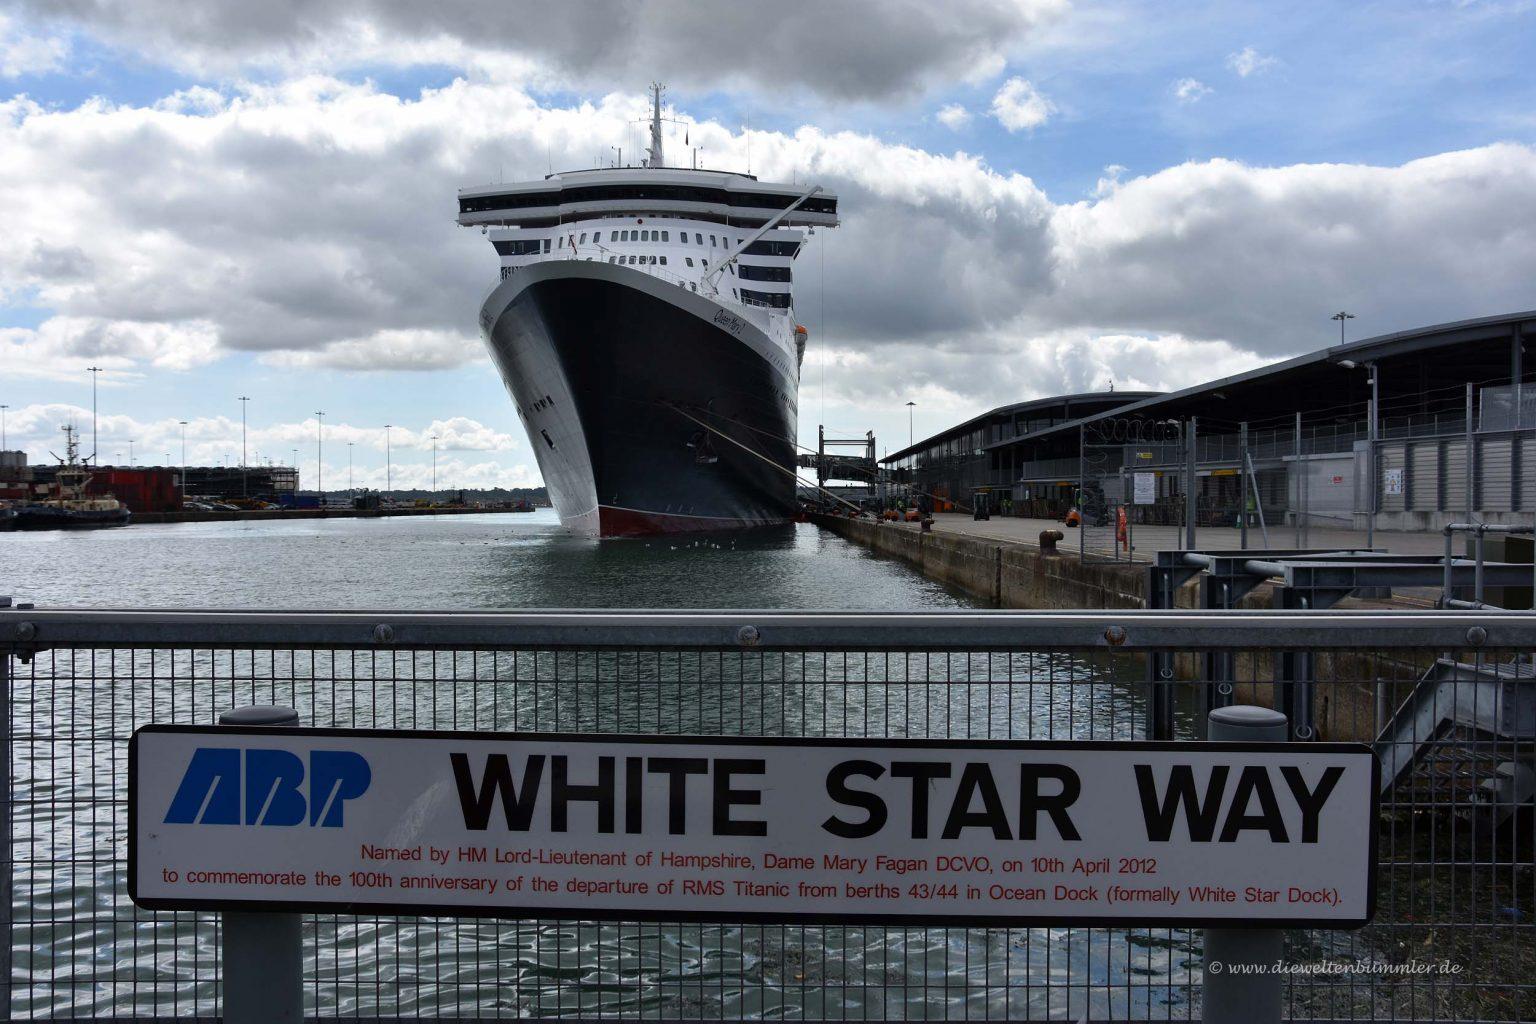 Hier legte auch die Titanic ab